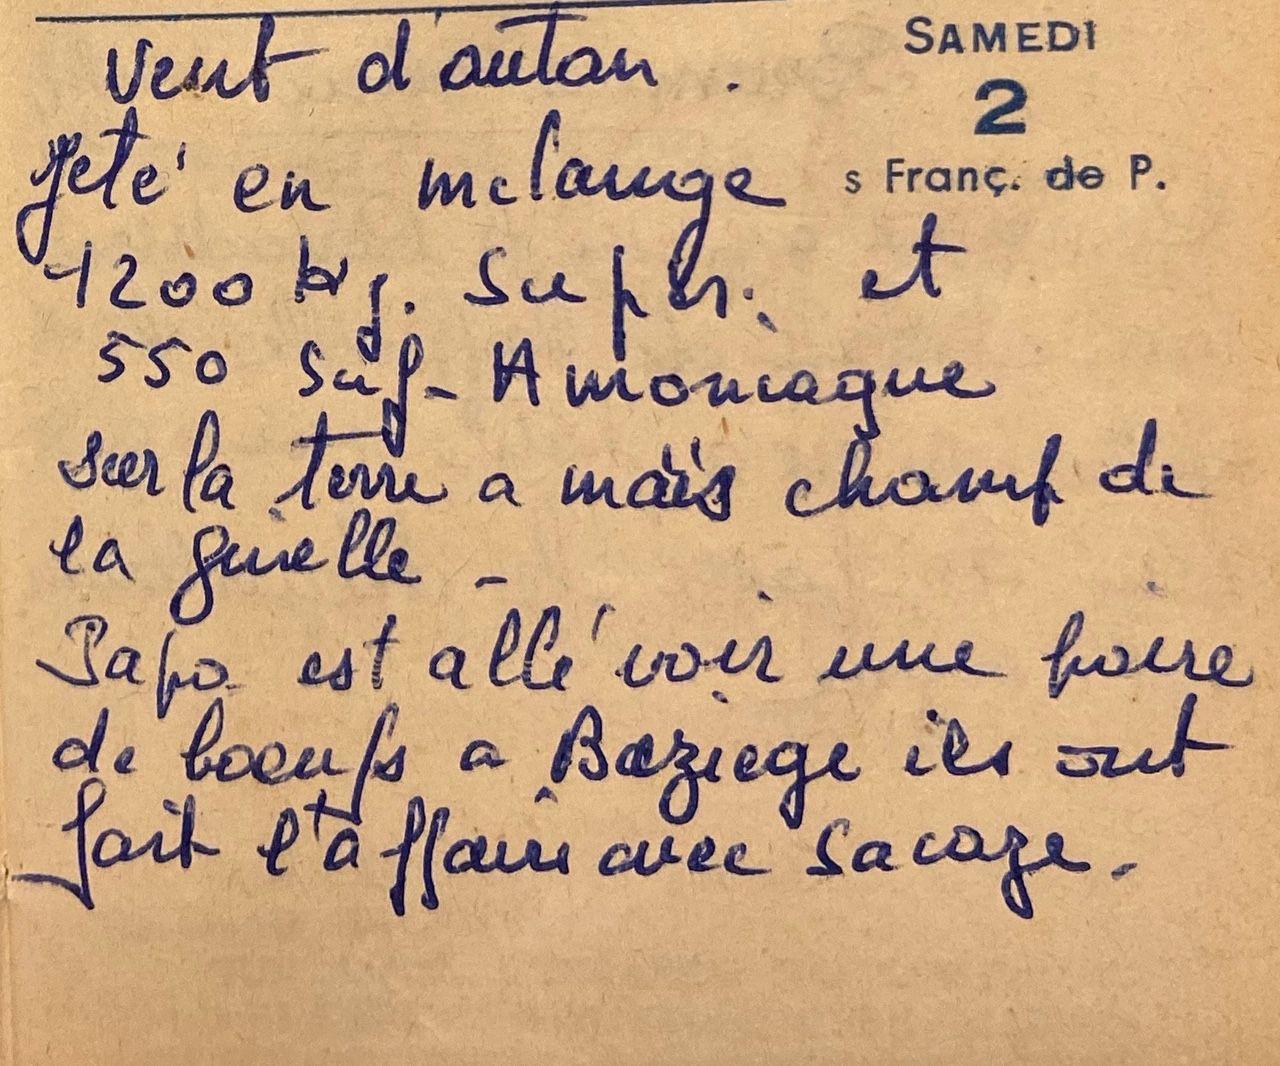 Samedi 2 avril 1960 - acheter une paire de boeufs